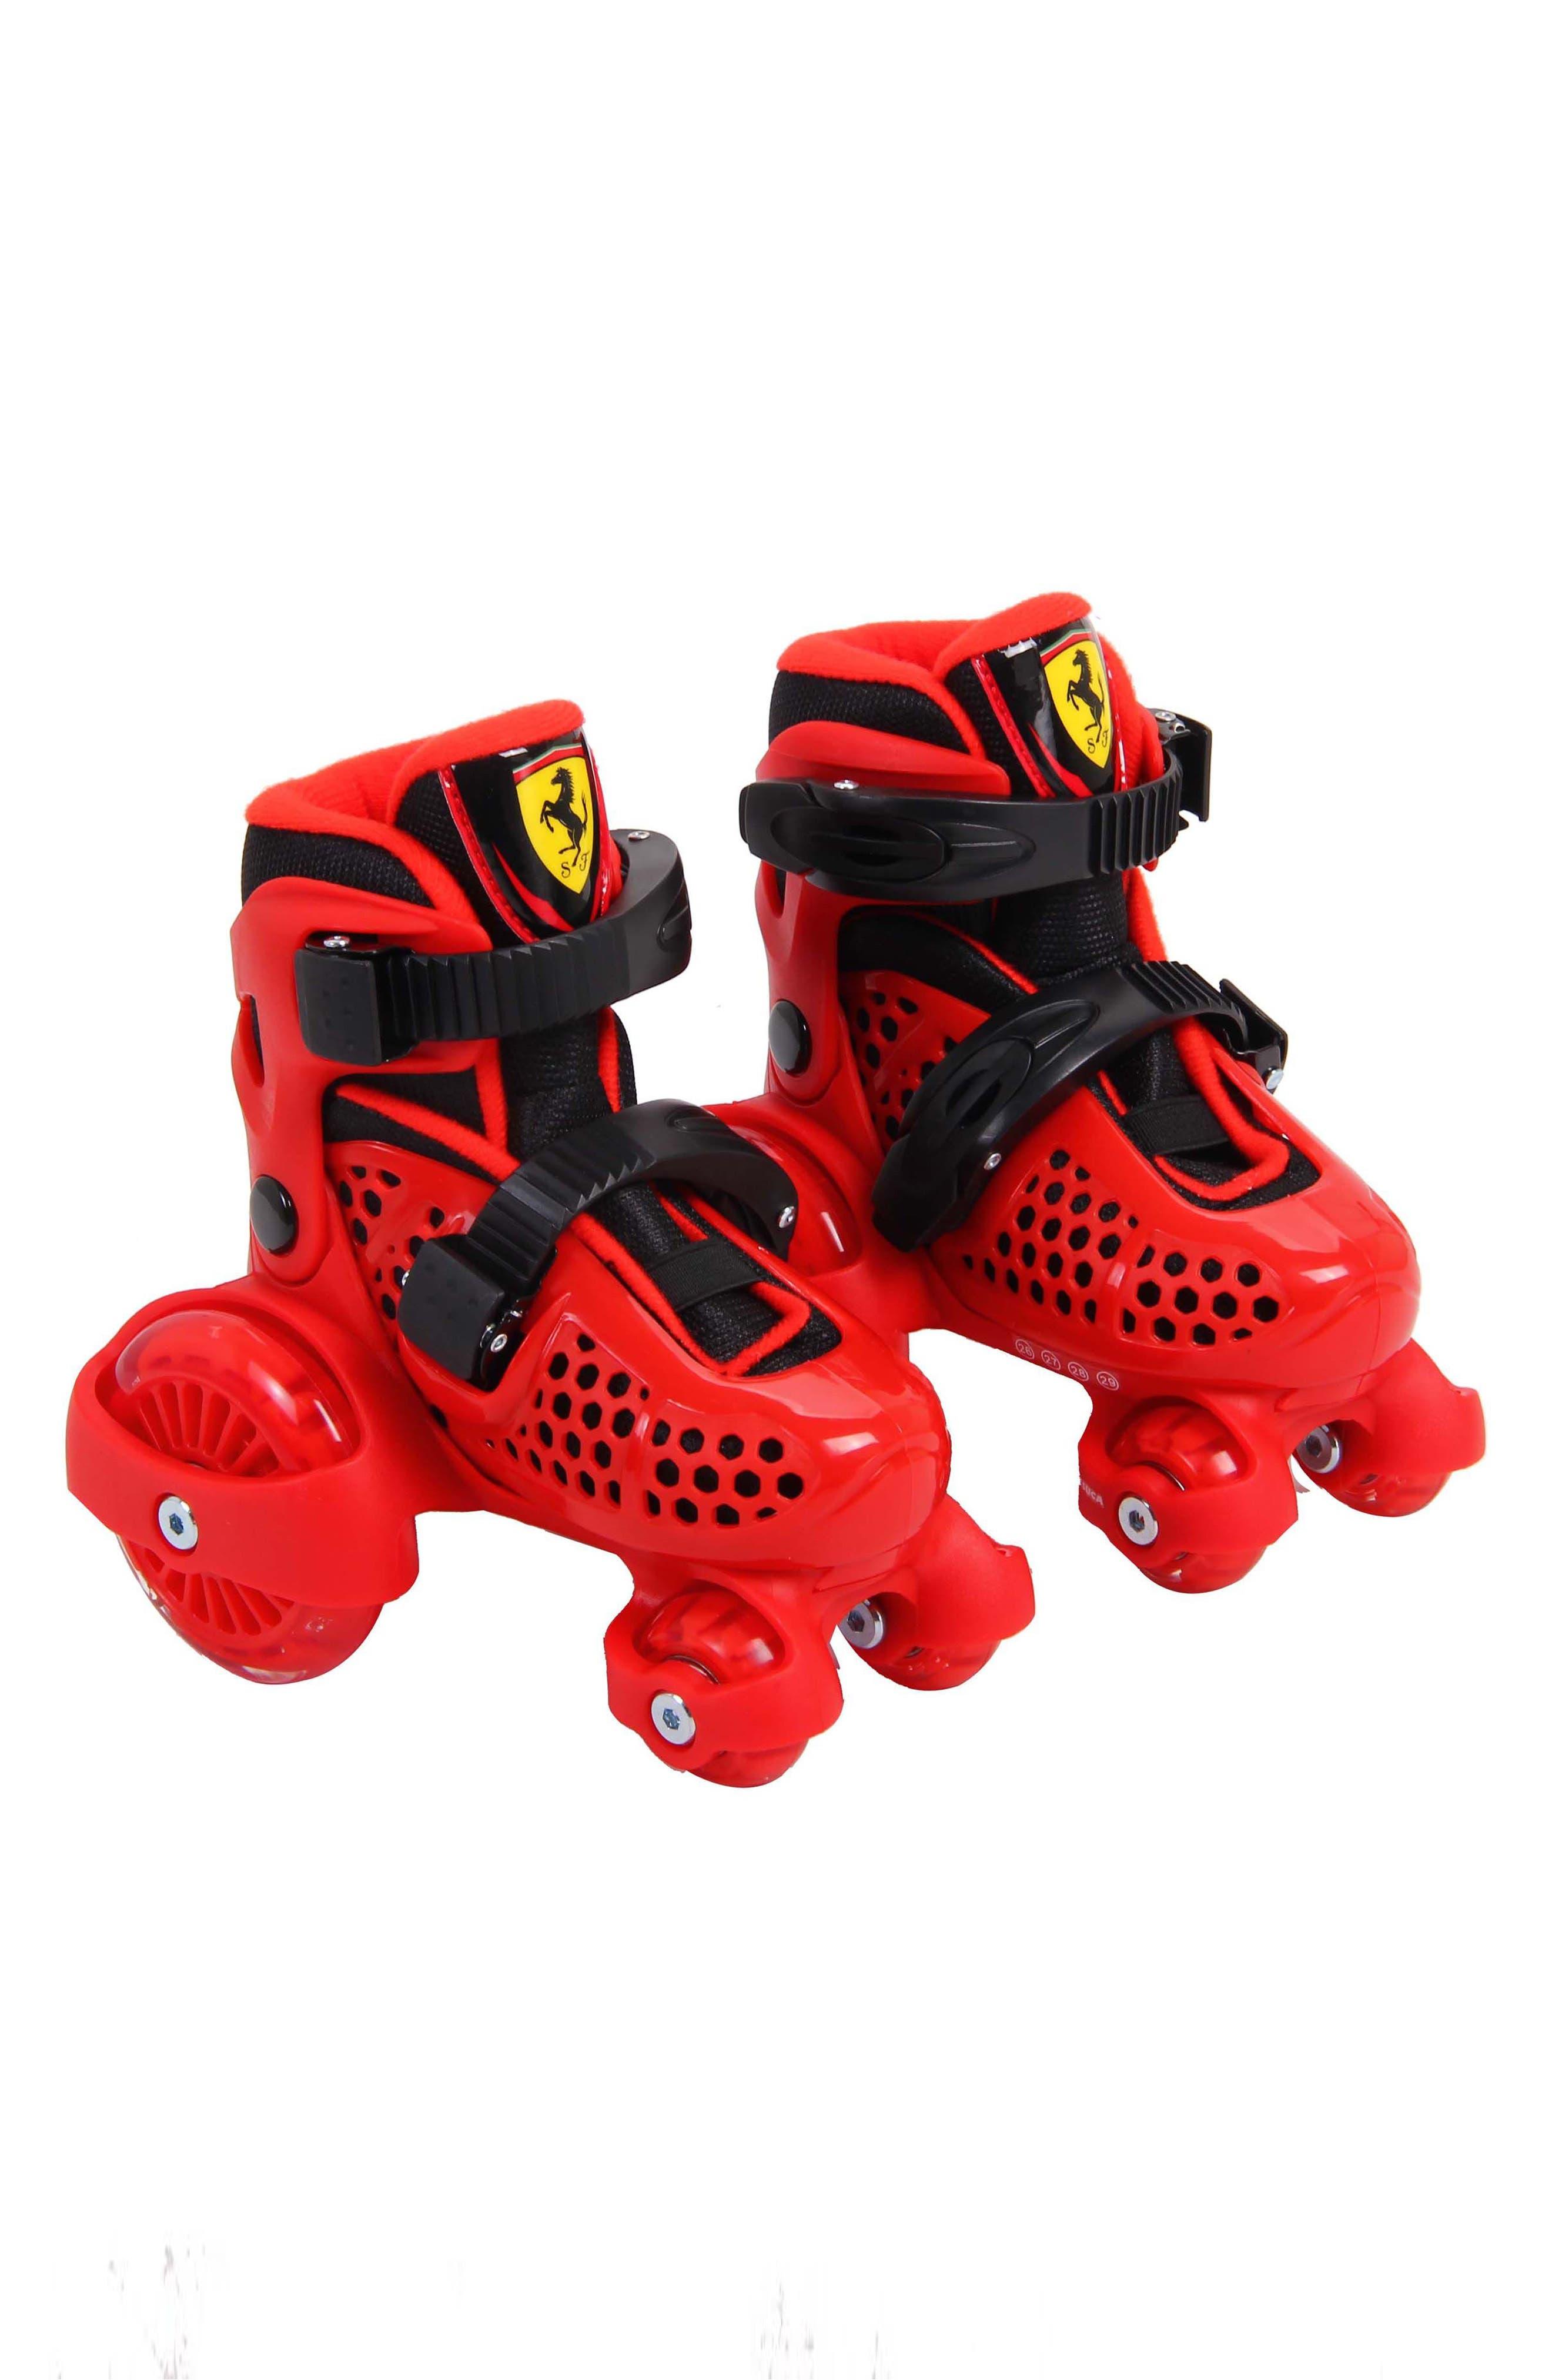 Ferrari My First Skate Rollerskate & Protective Gear Set